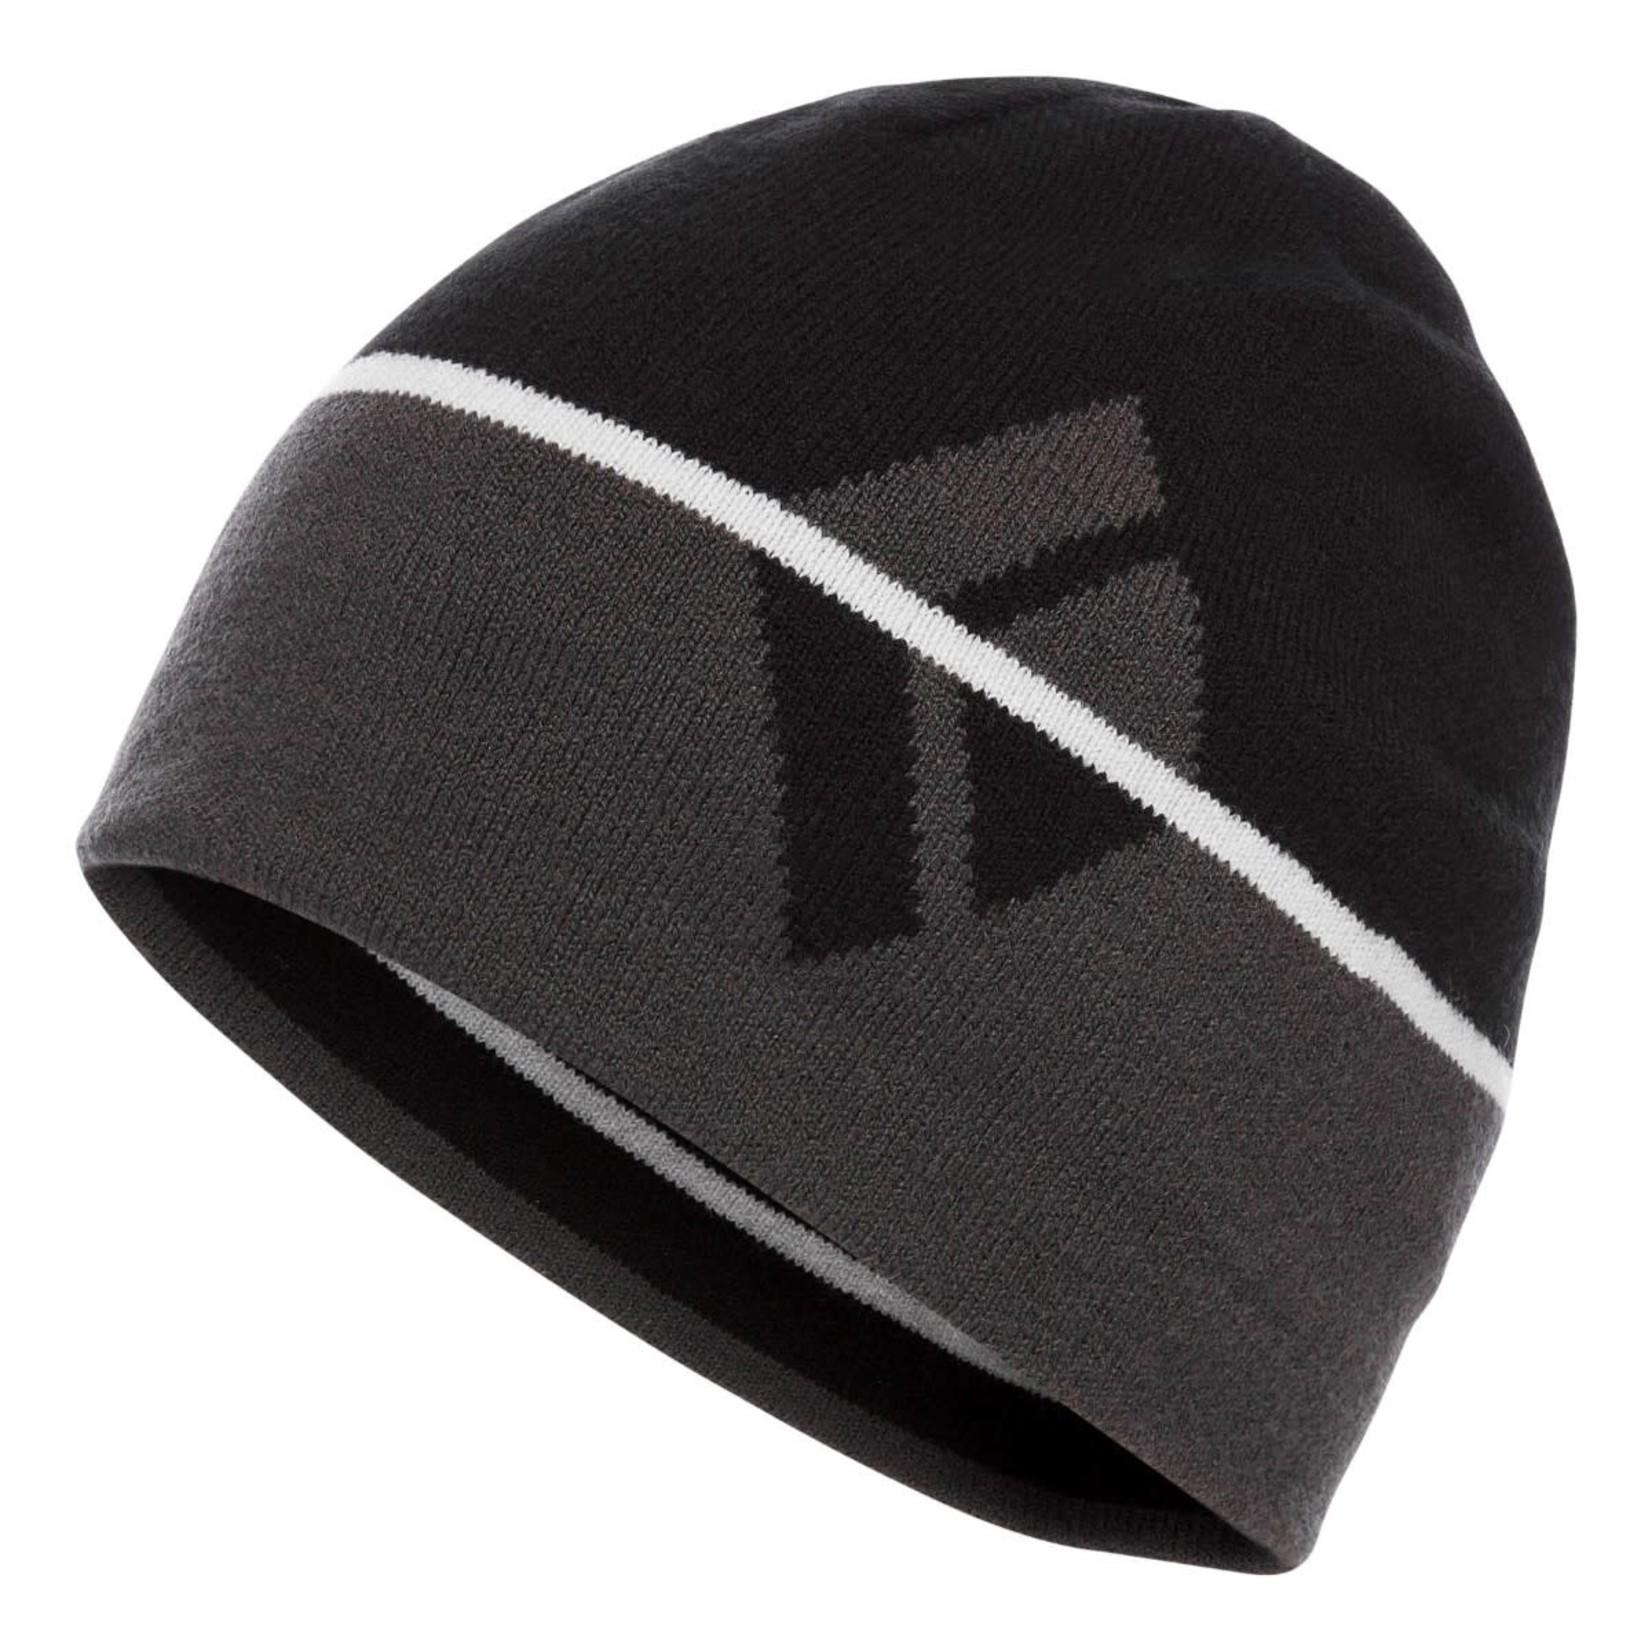 Black Diamond Tuque Black Diamond Brand Beanie - Unisexe